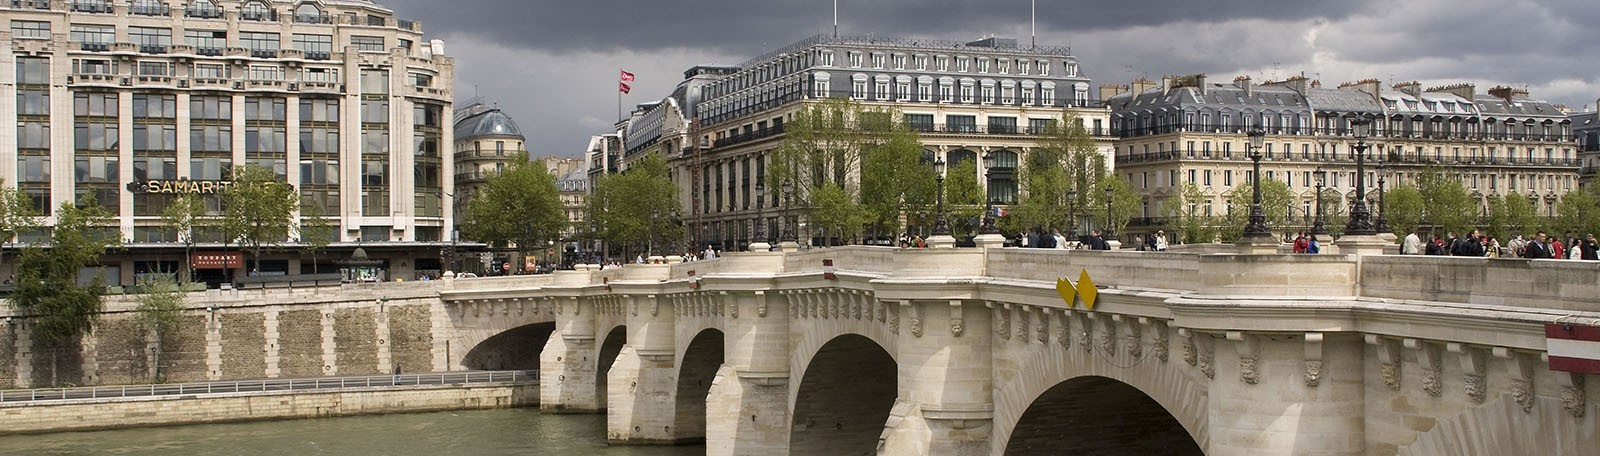 Réservation parking Rivoli Pont Neuf Paris